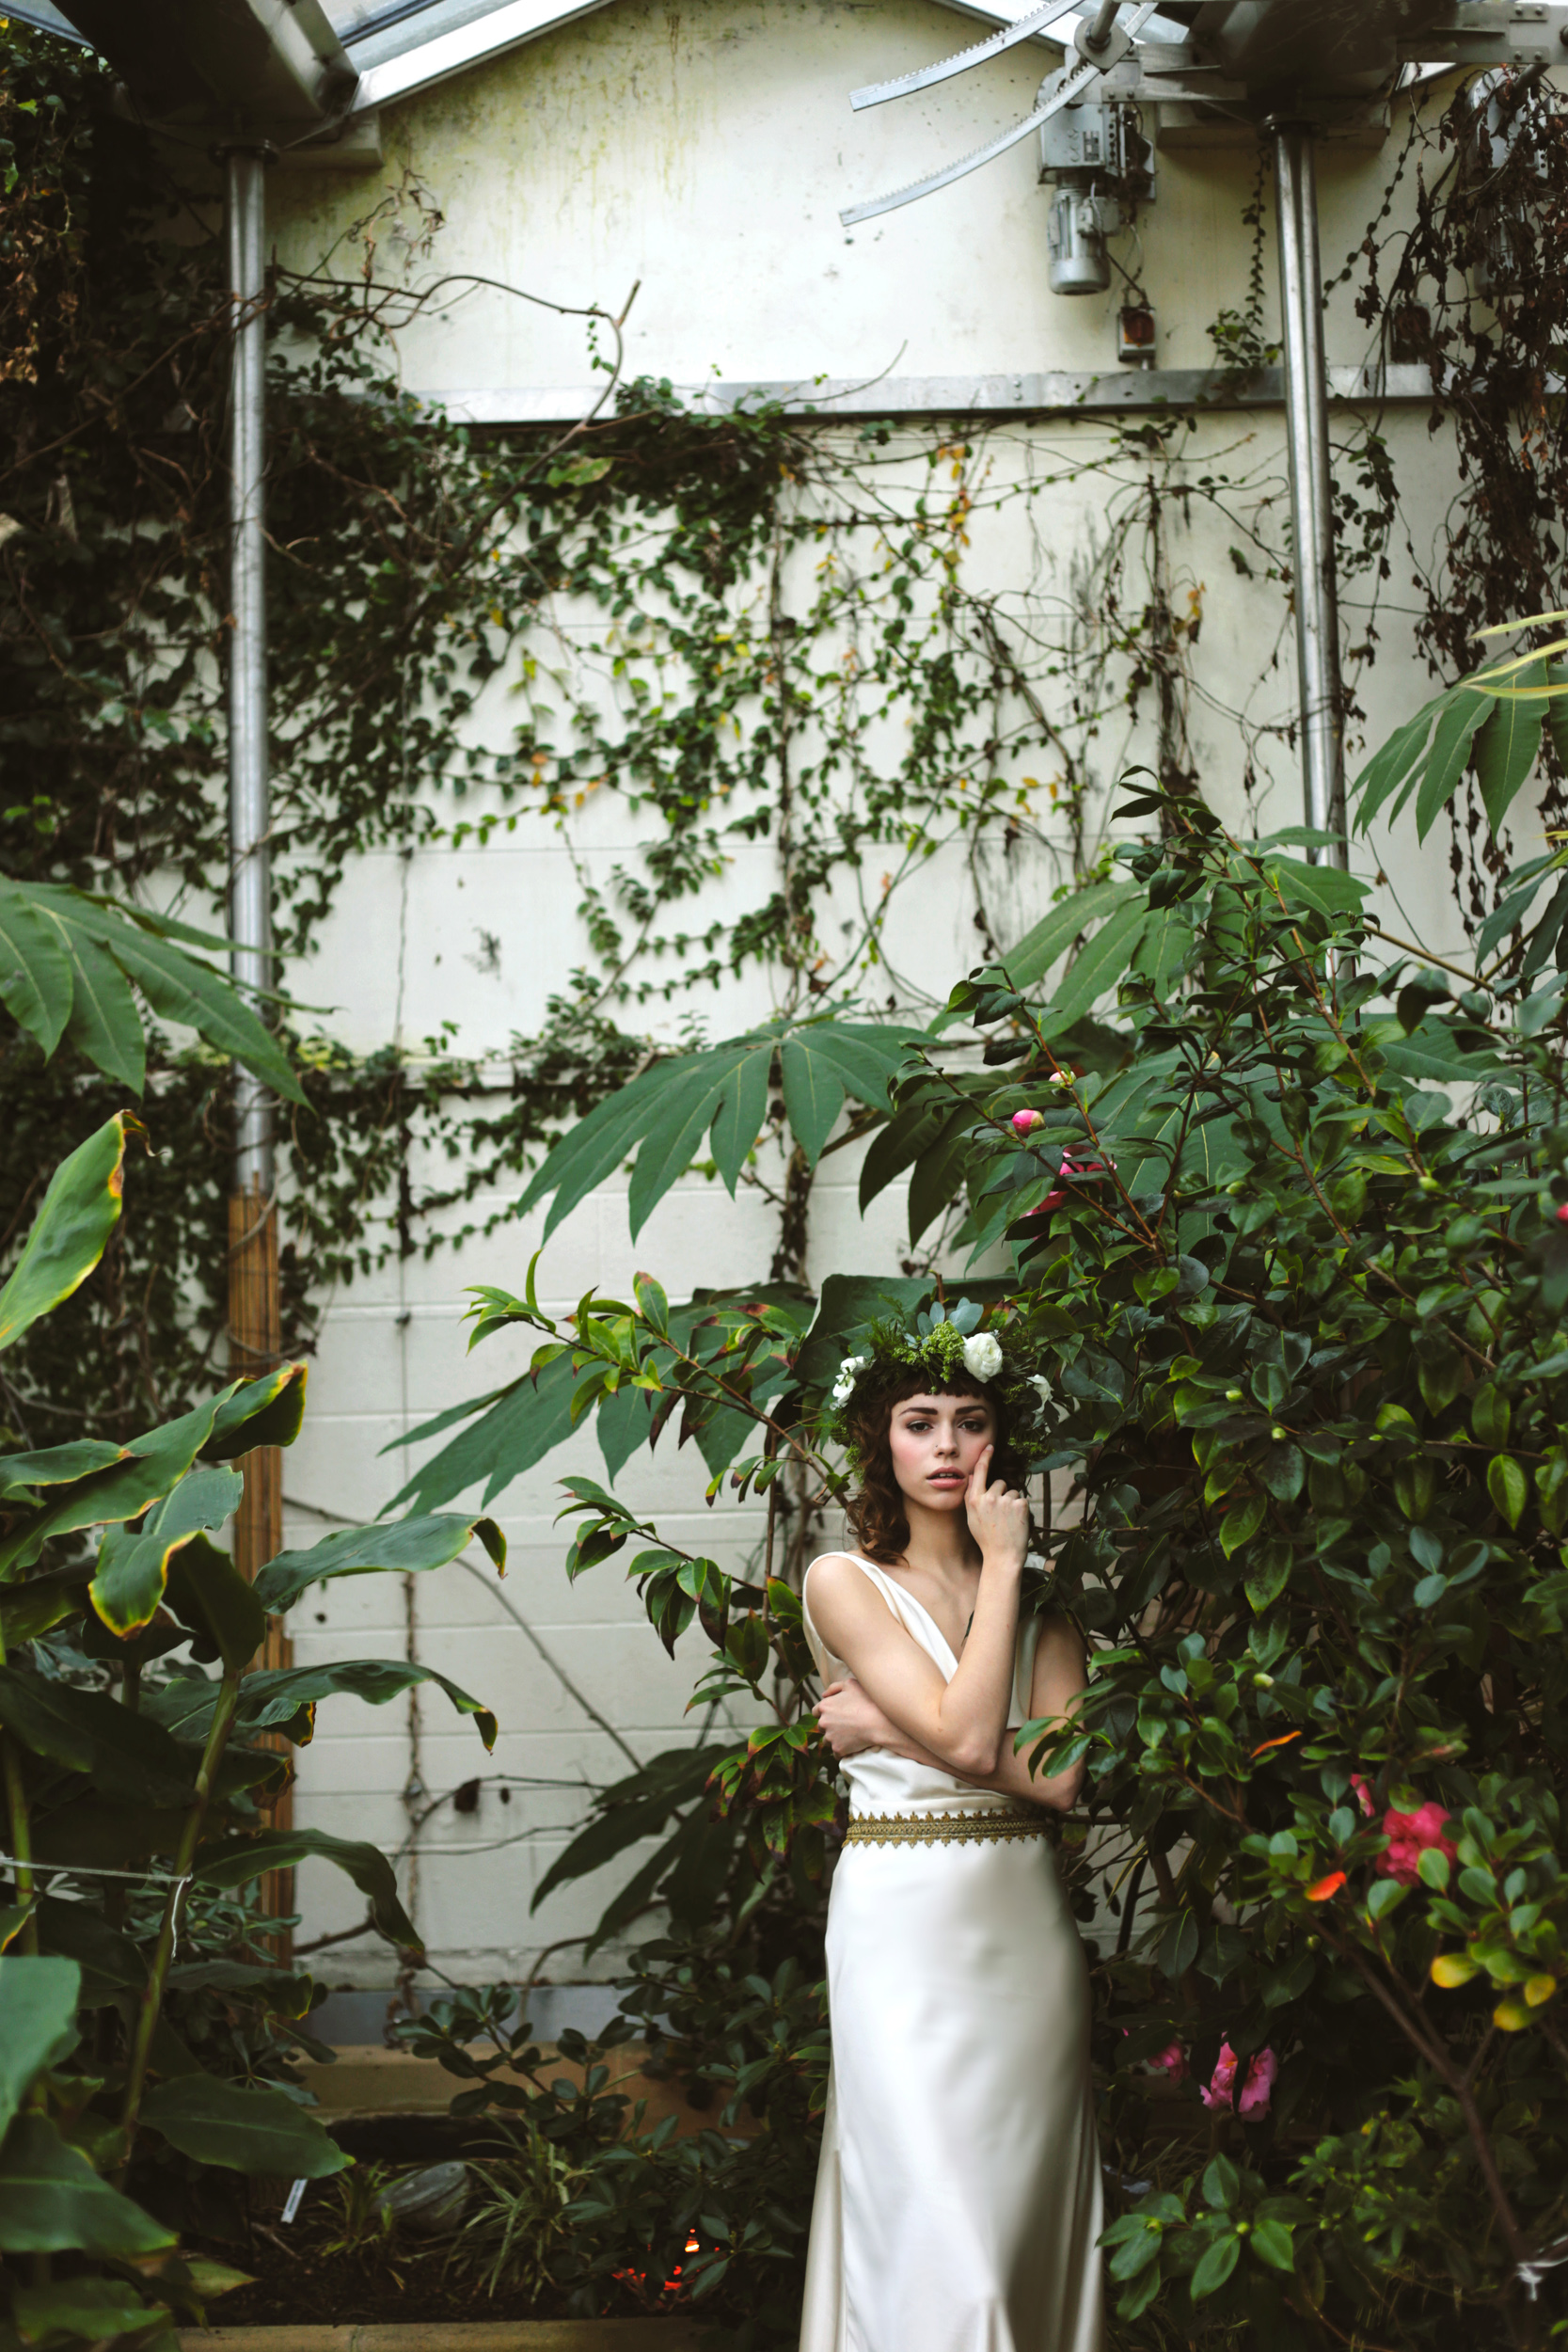 Winter-Bridal-Kate-Beaumont-Shelley-Richmond-Vintage-Wedding-Dress-3.jpg